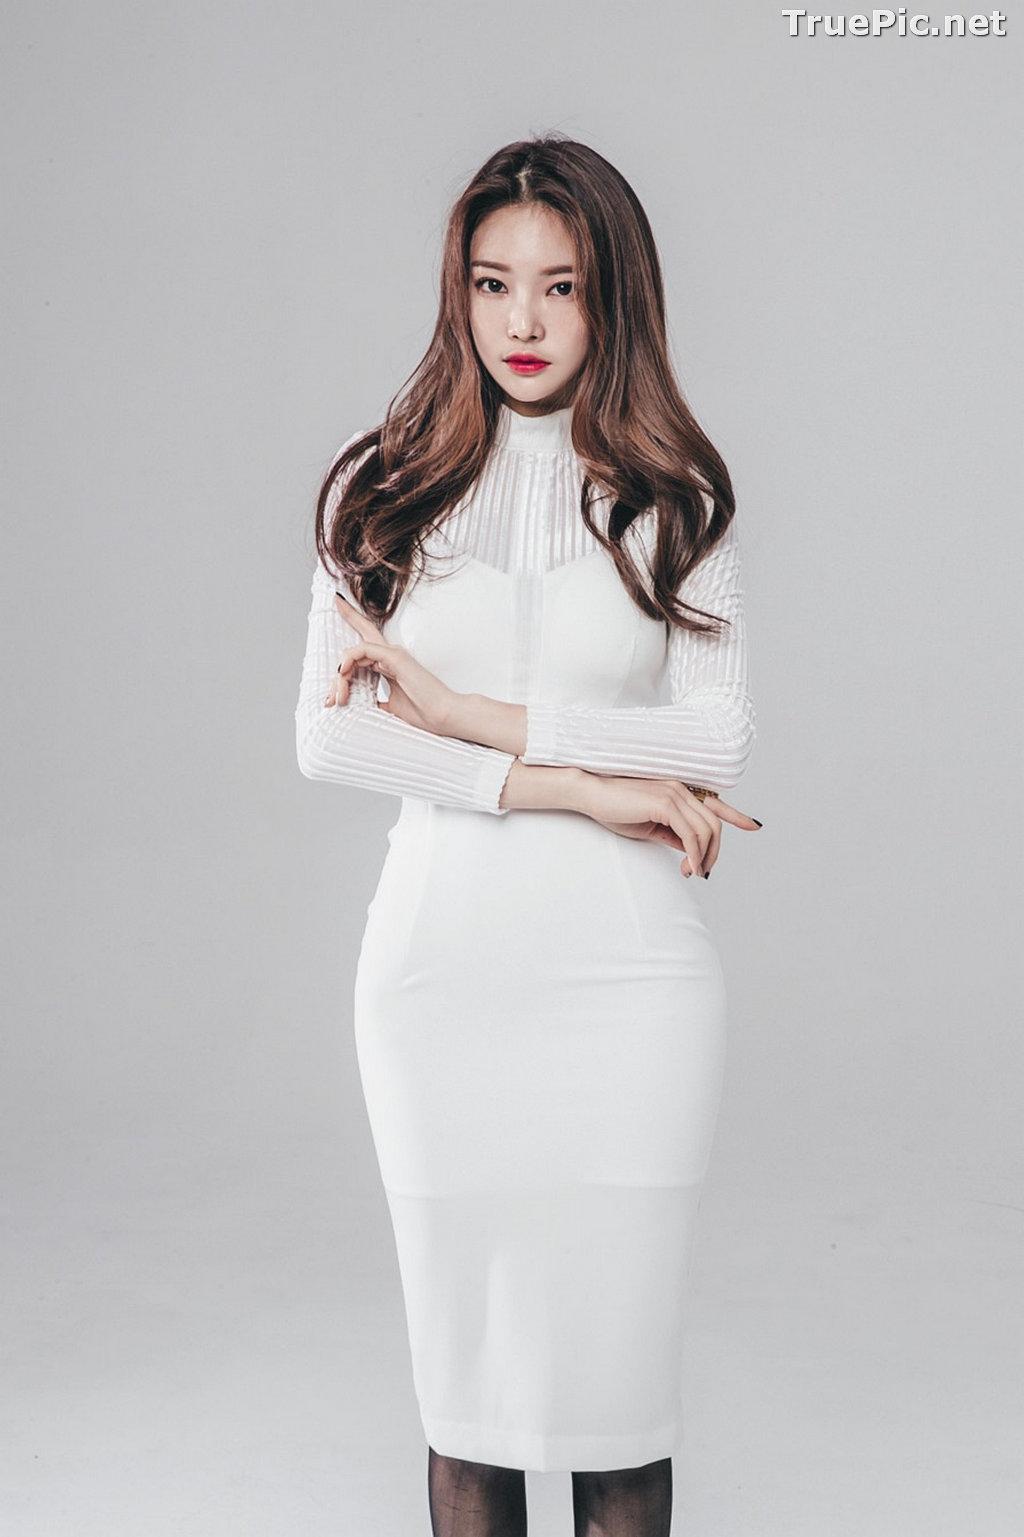 Image Korean Beautiful Model – Park Jung Yoon – Fashion Photography #11 - TruePic.net - Picture-56